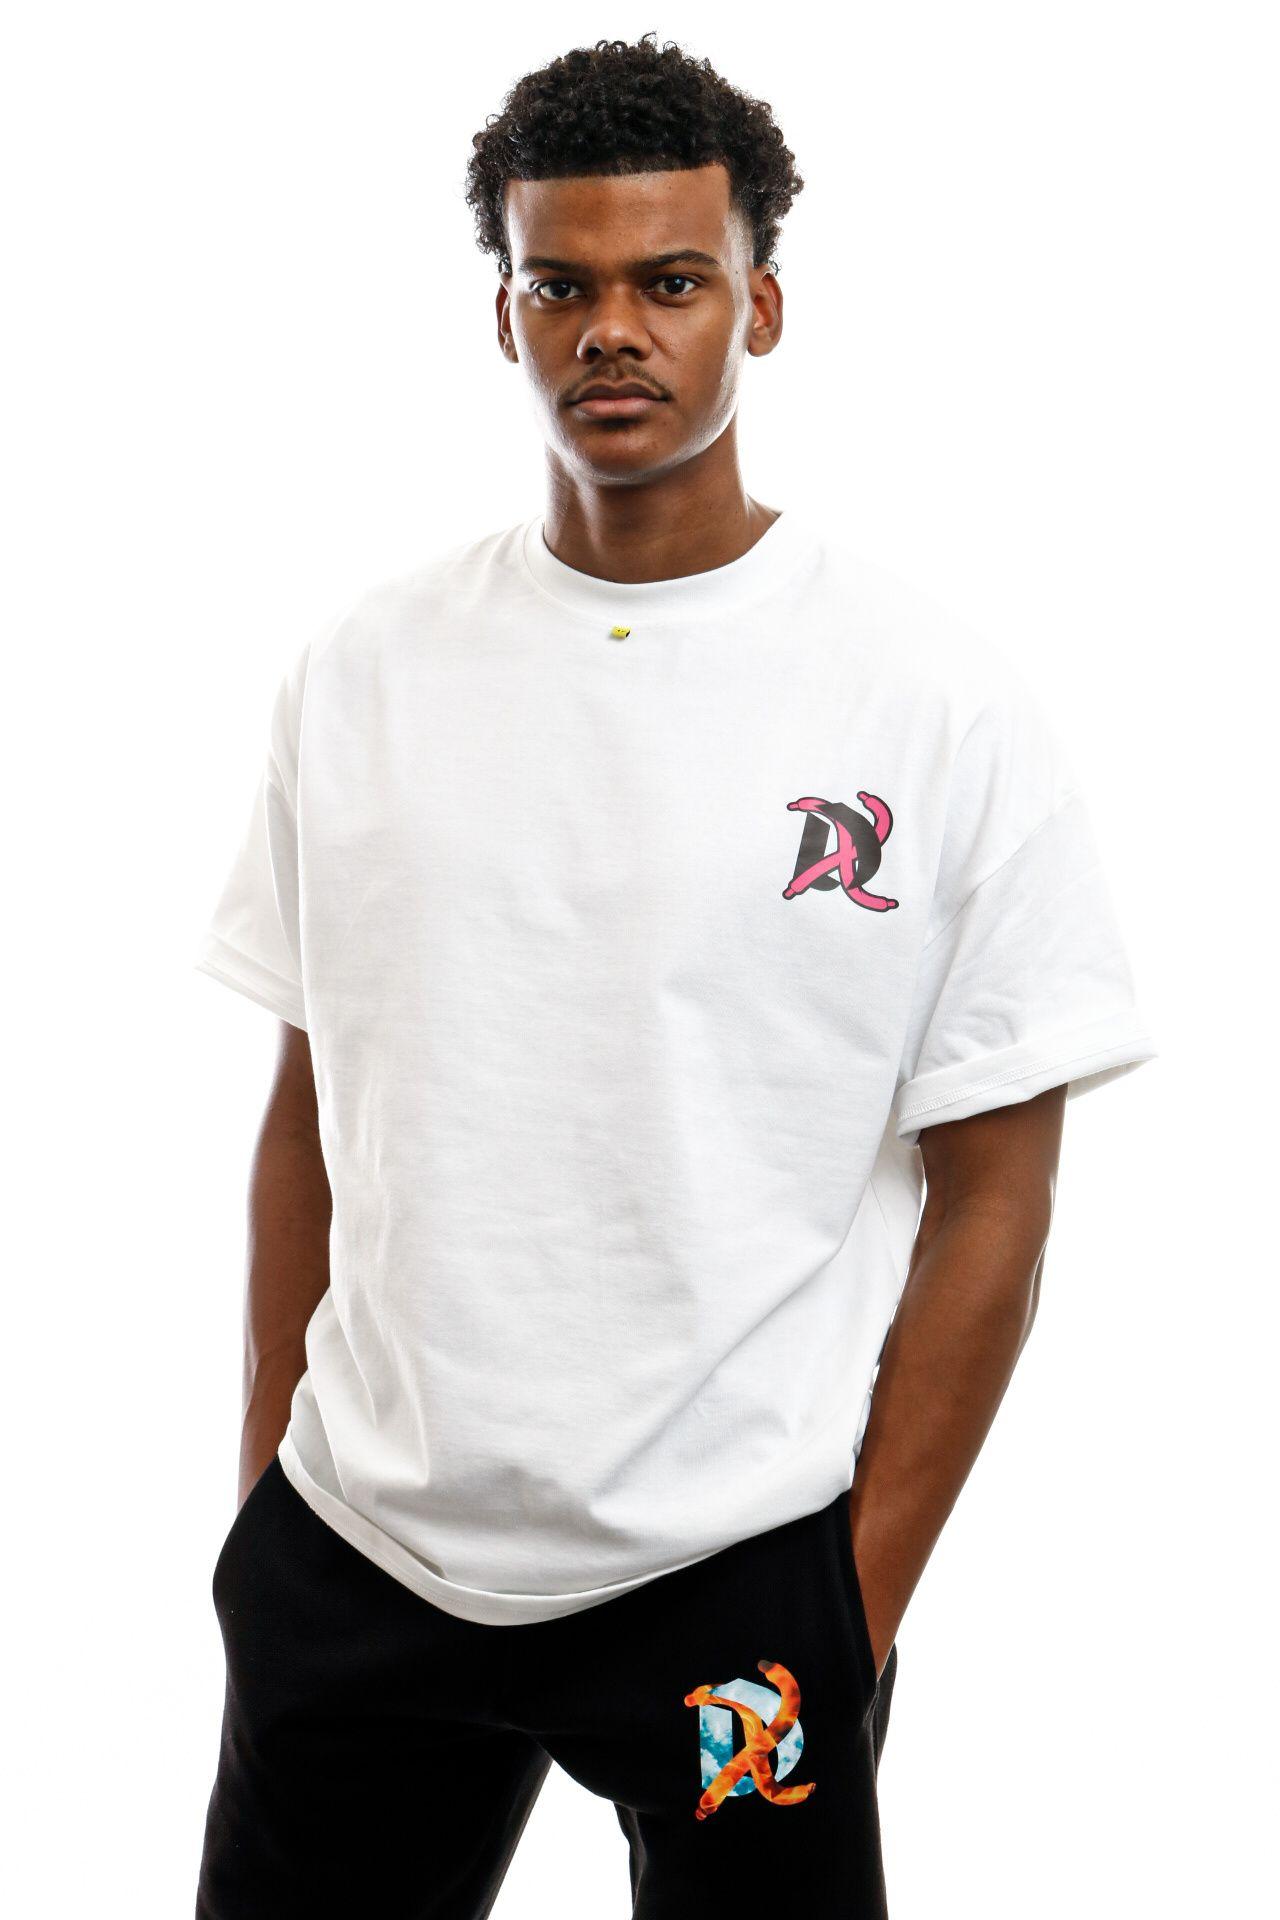 Afbeelding van Latest Delivery T-Shirt LD x EXQLU TEE Wit